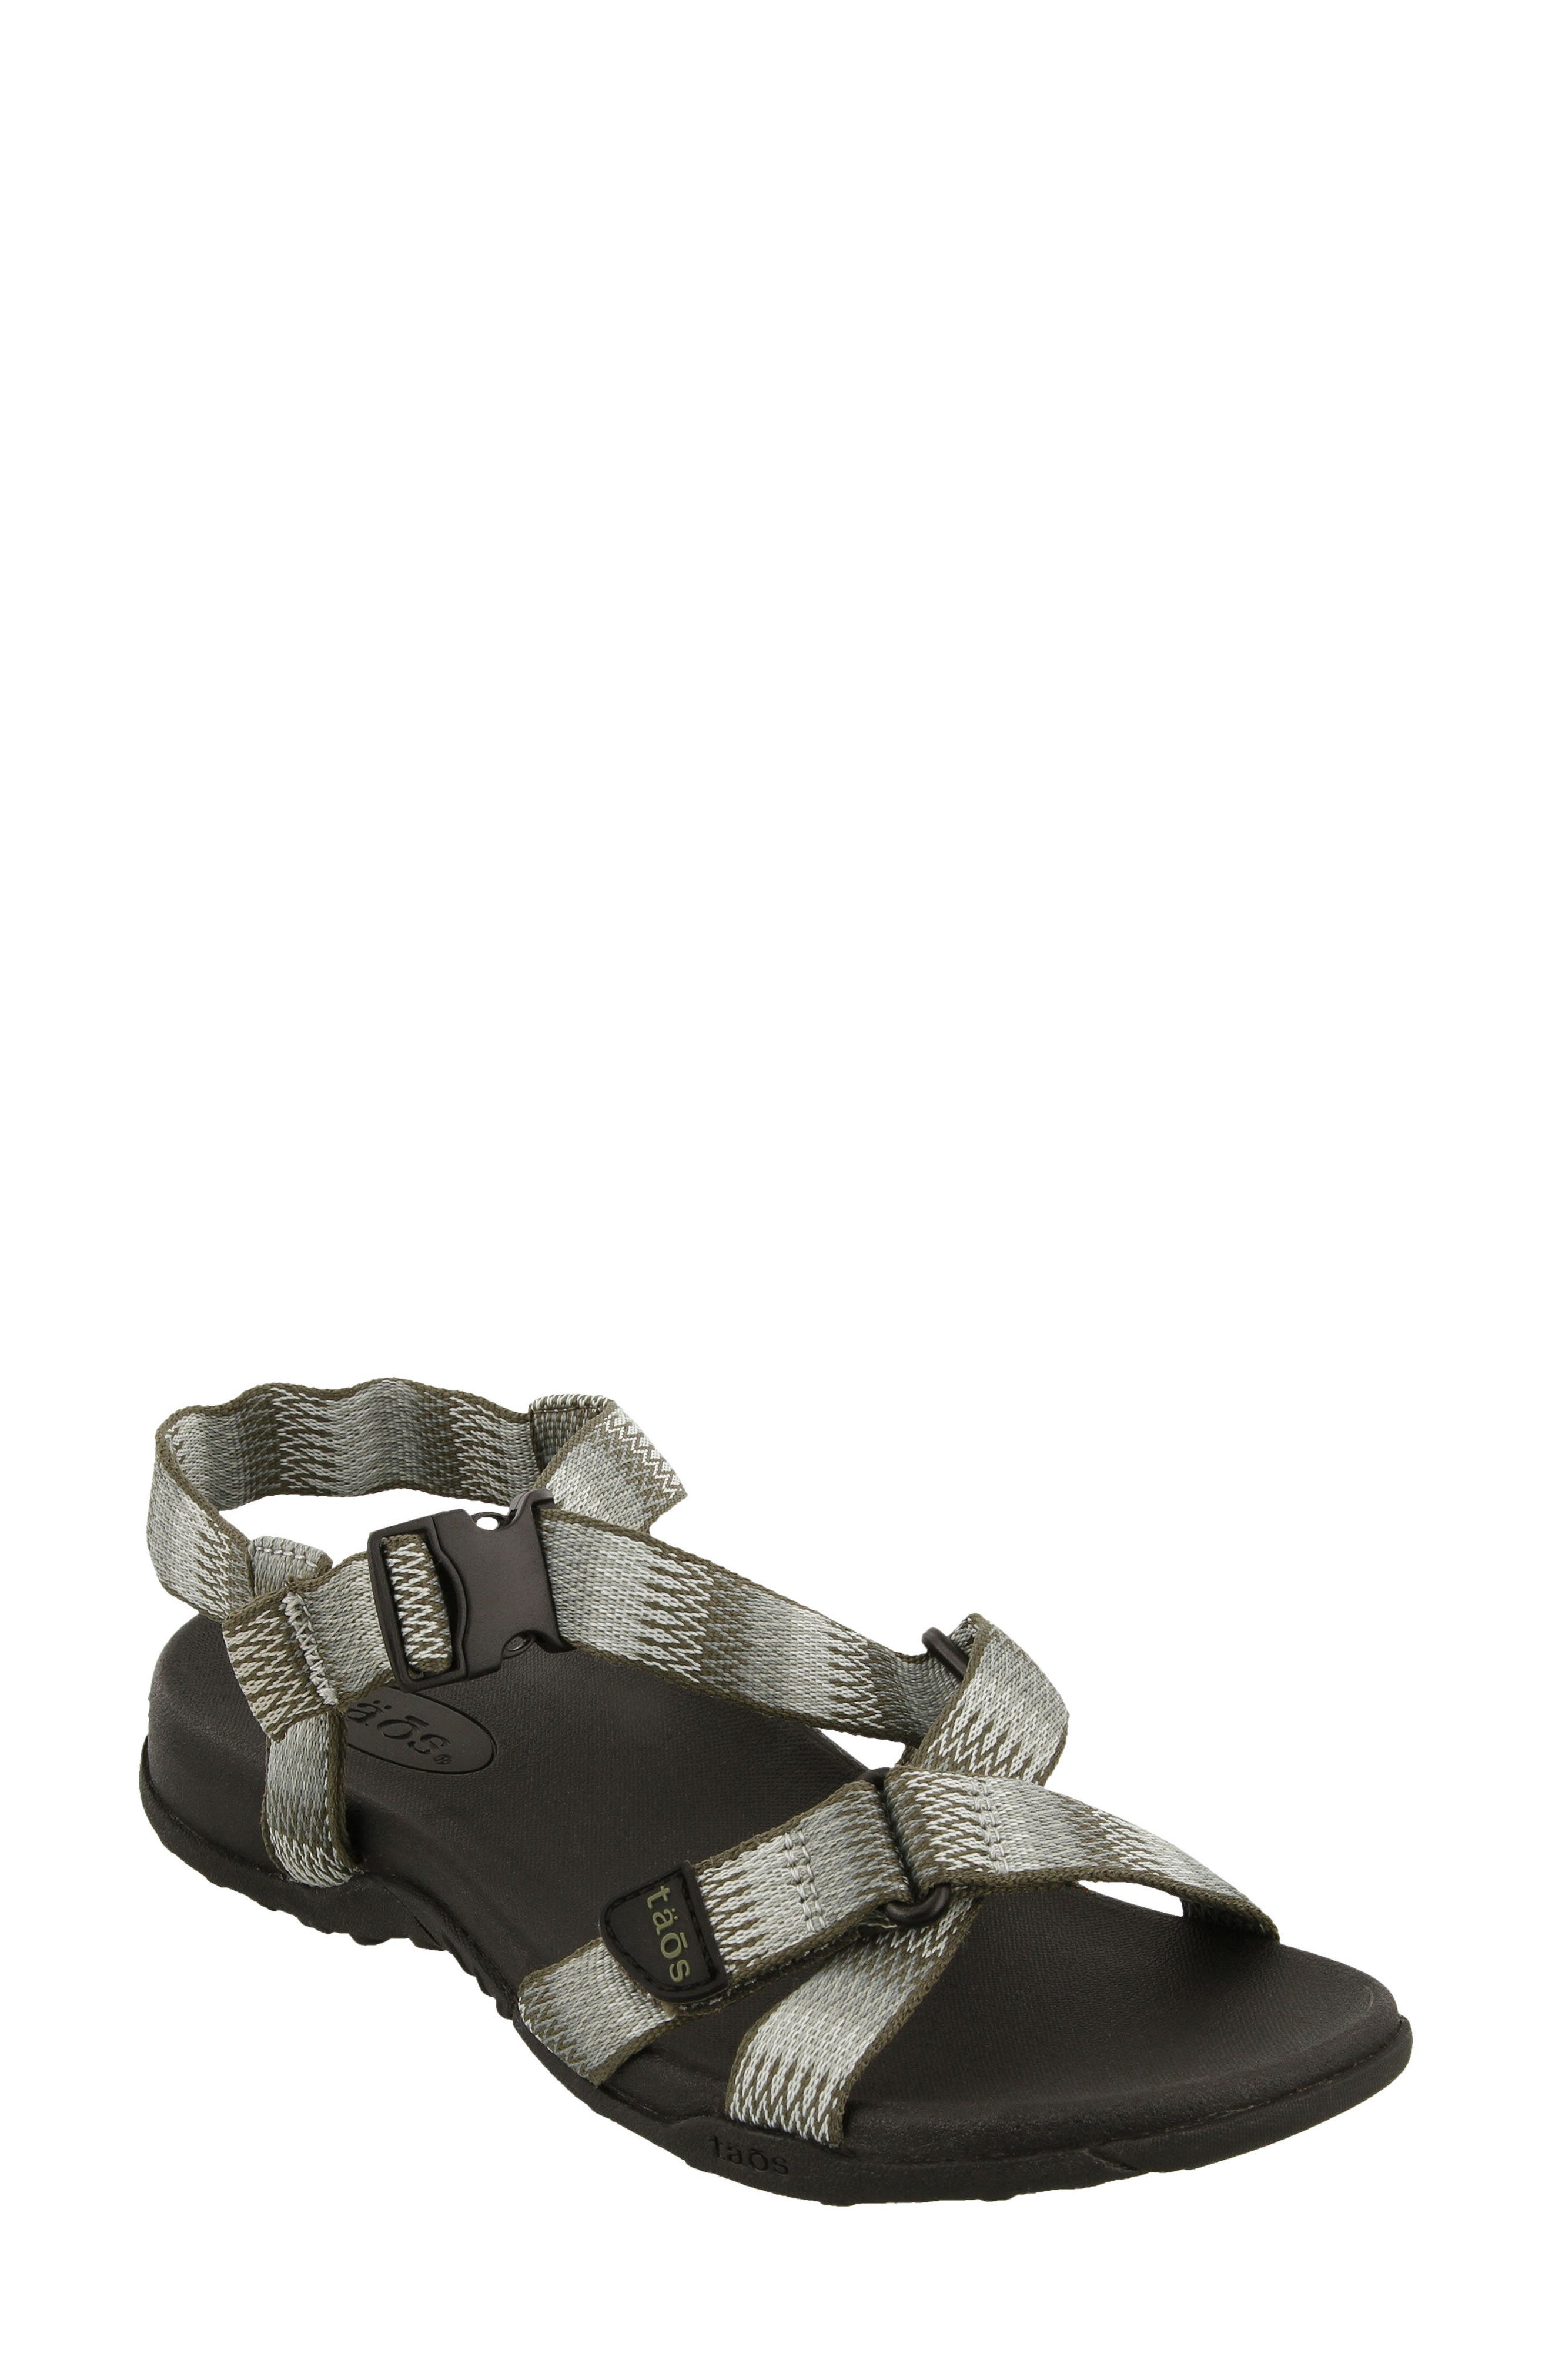 New Wave Sandal,                         Main,                         color, SAGE FABRIC